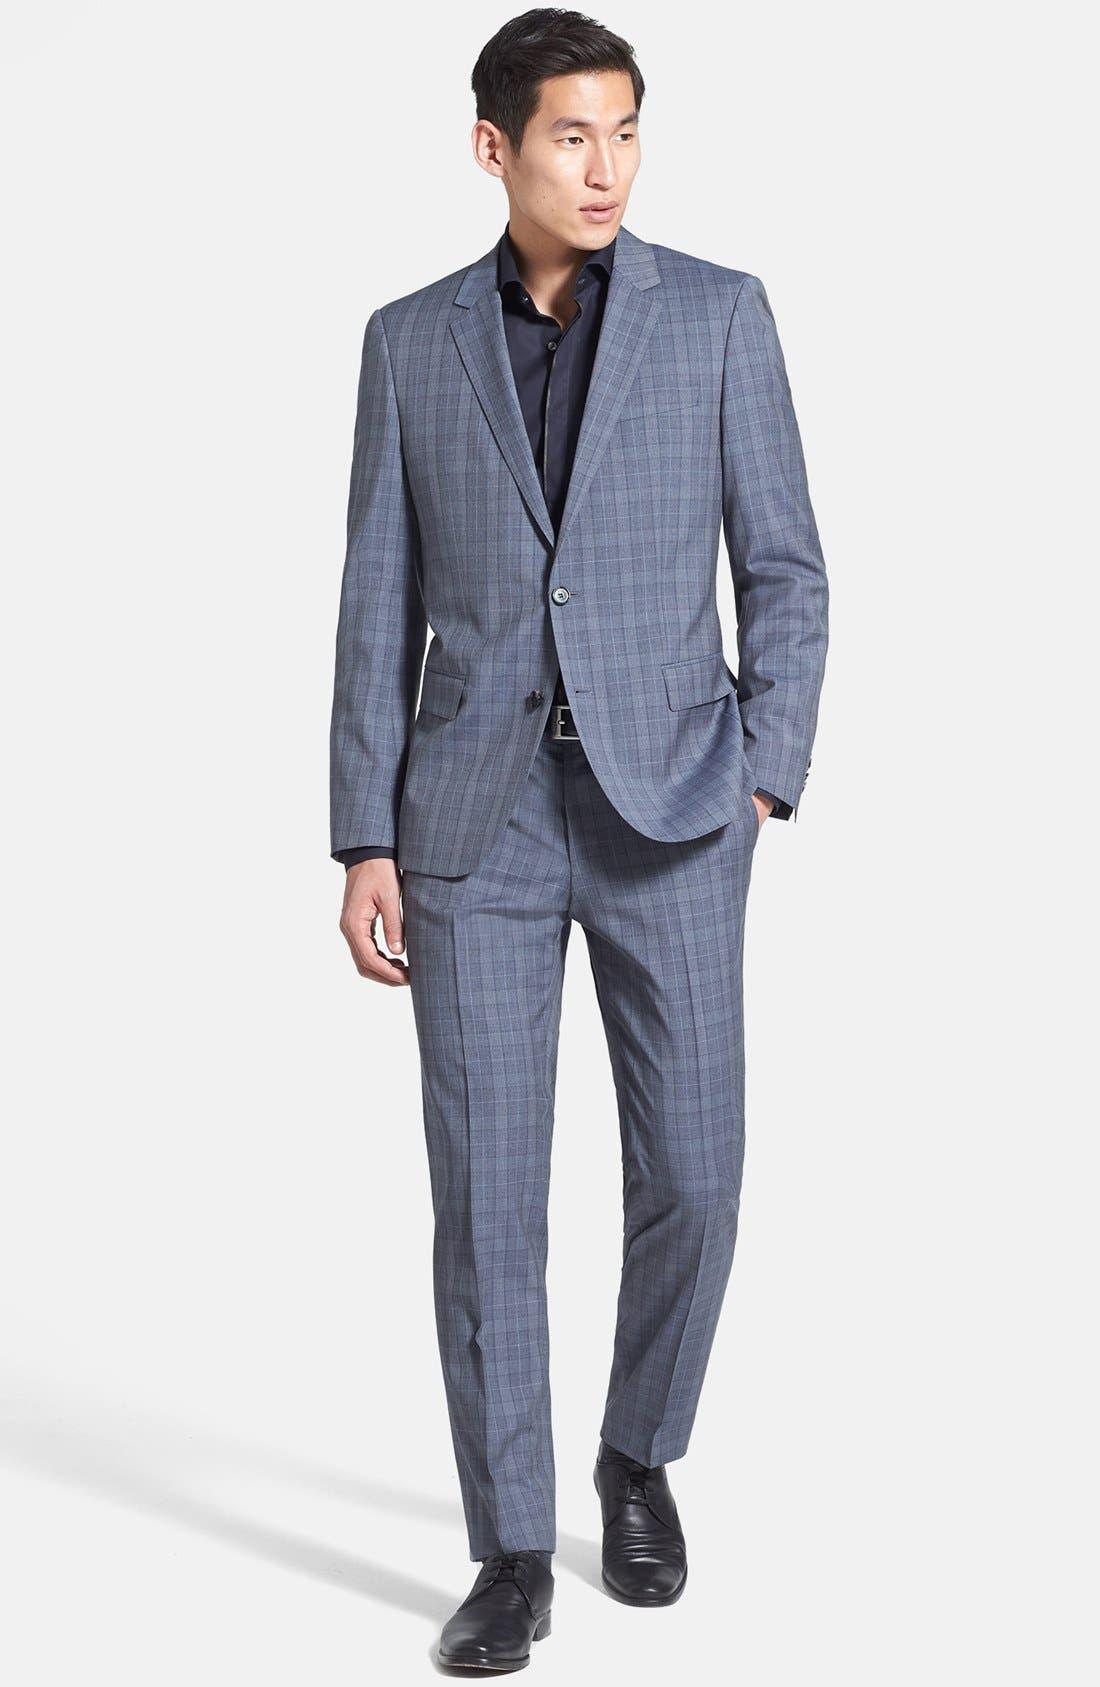 Main Image - BOSS HUGO BOSS Suit & Dress Shirt